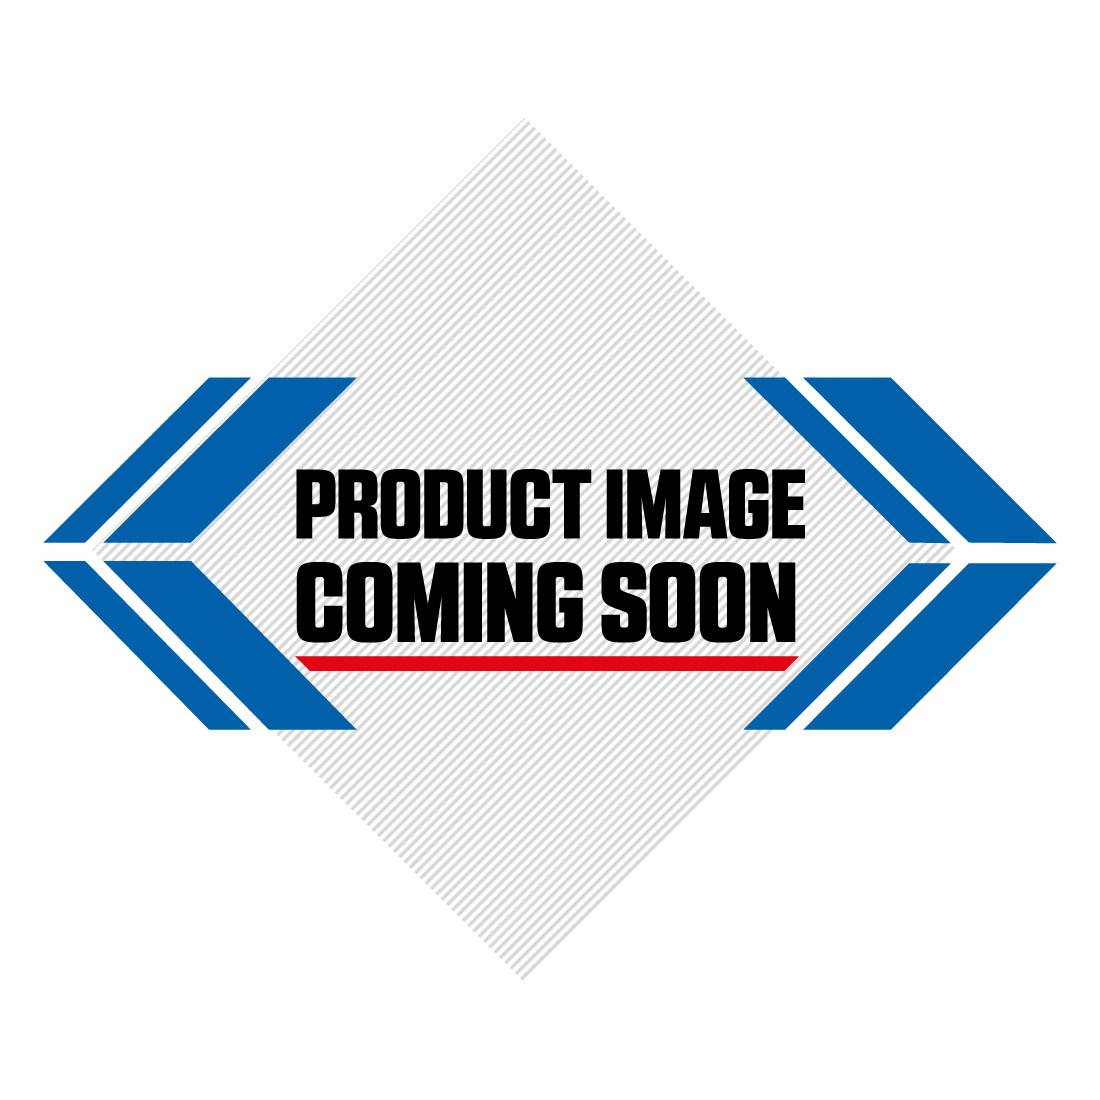 Renthal Twinring Rear Sprocket Kawasaki KX KXF KDX KLX Suzuki RMZ - Green Image-5